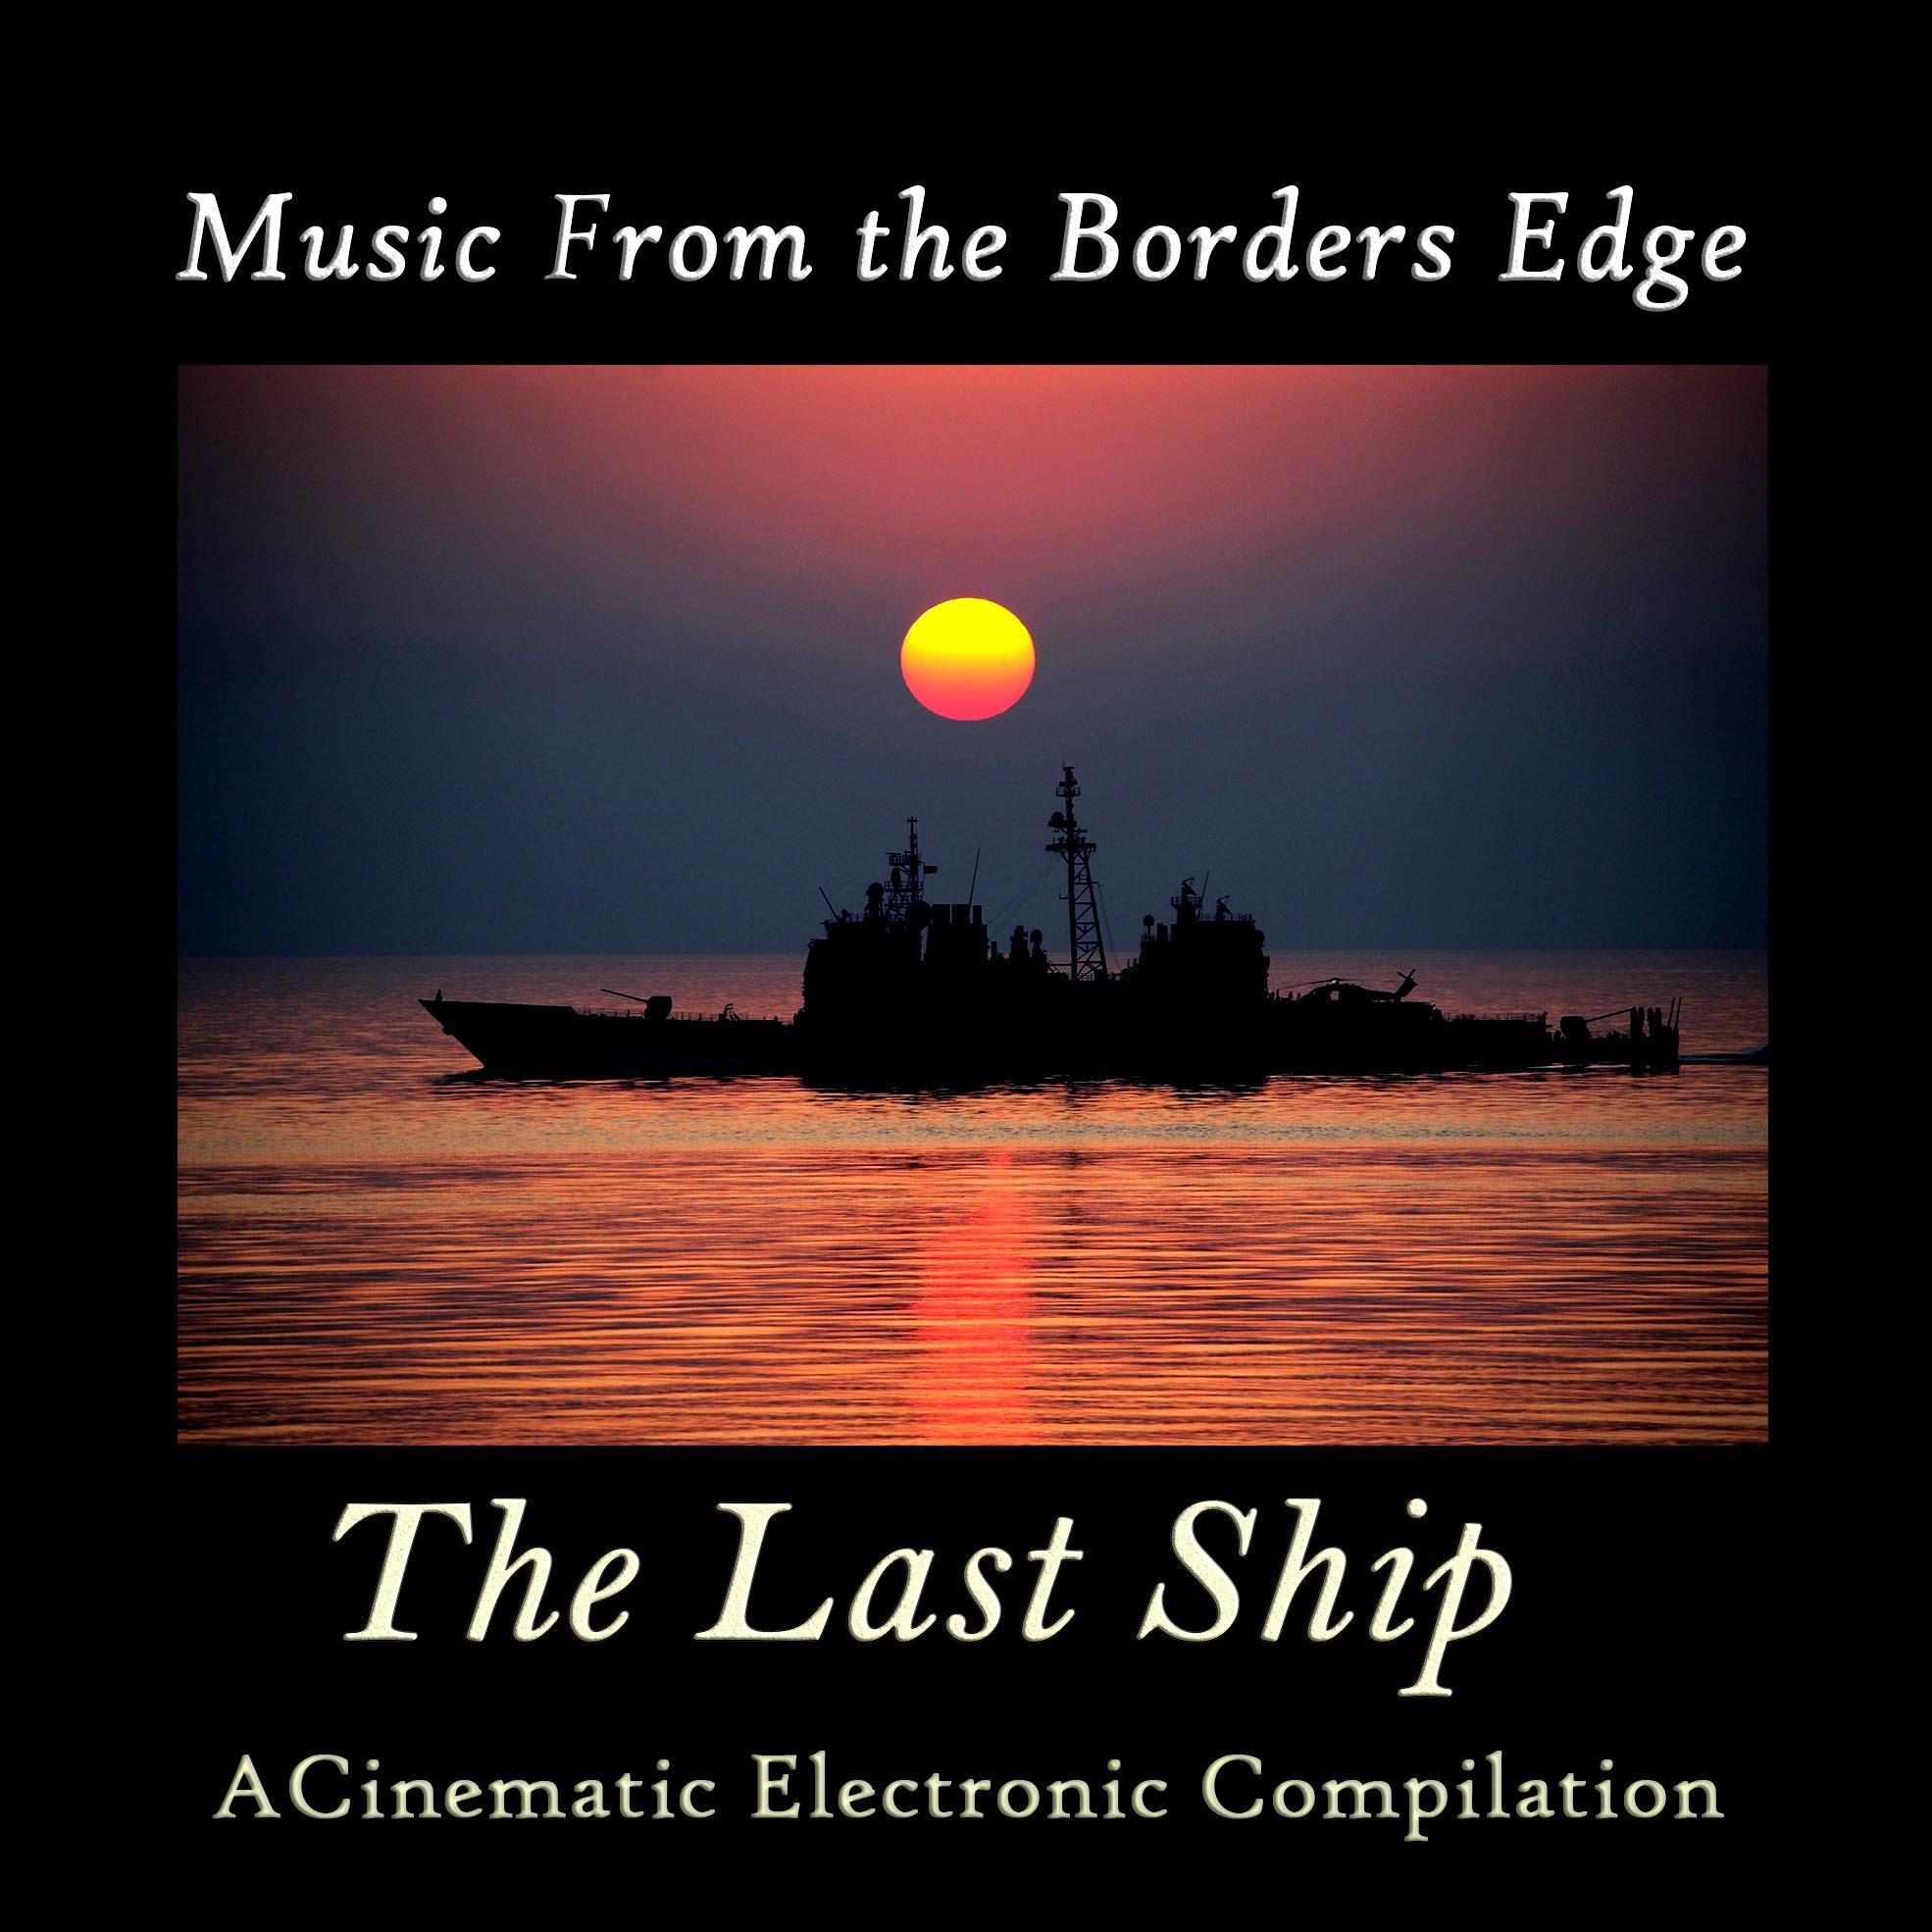 https://bordersedge.bandcamp.com/album/the-last-ship